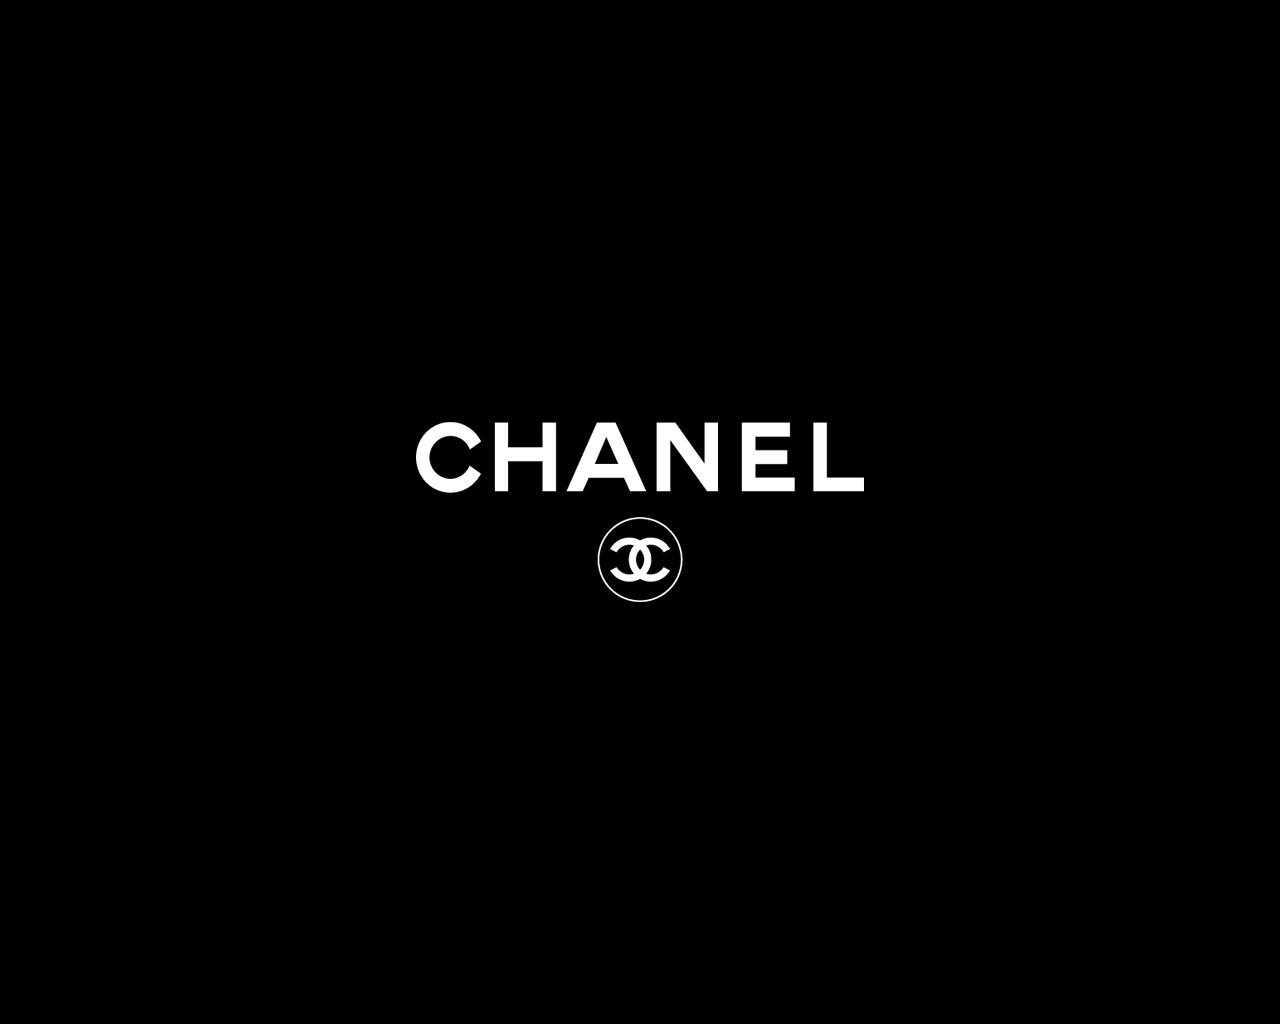 Coco Chanel Logo Wallpaper - WallpaperSafari